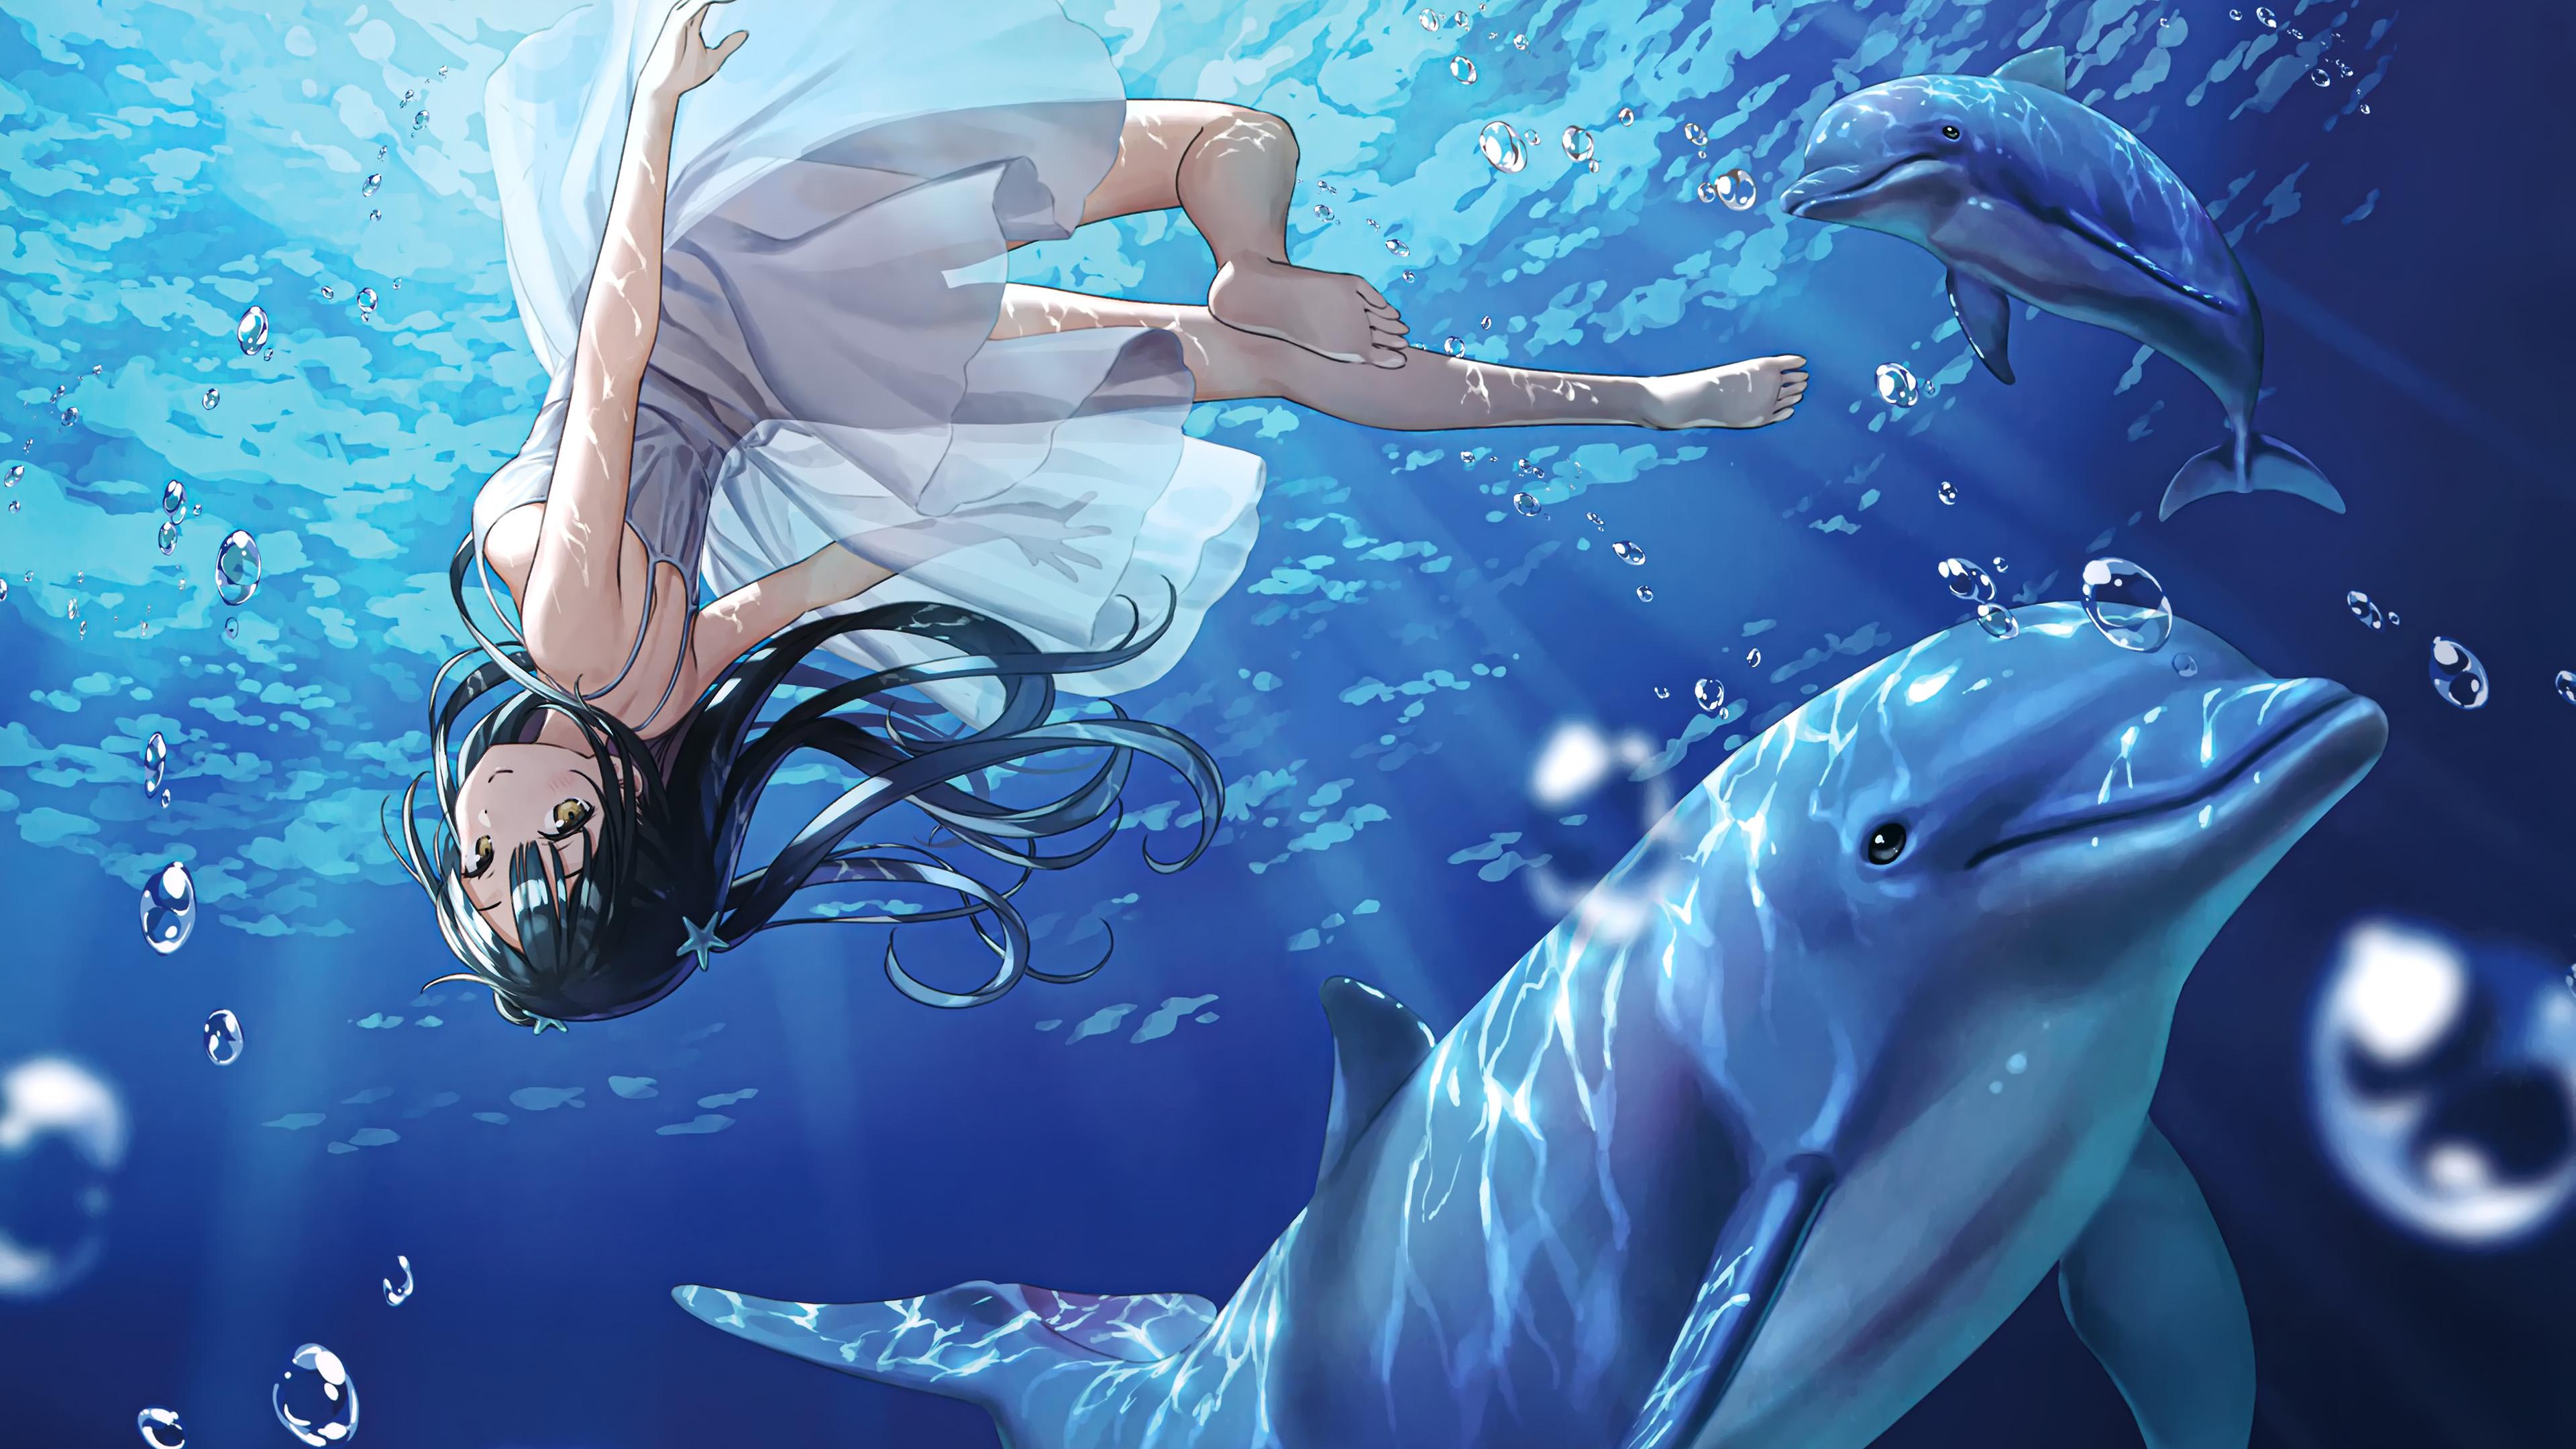 4K专区,海豚,深海,女孩